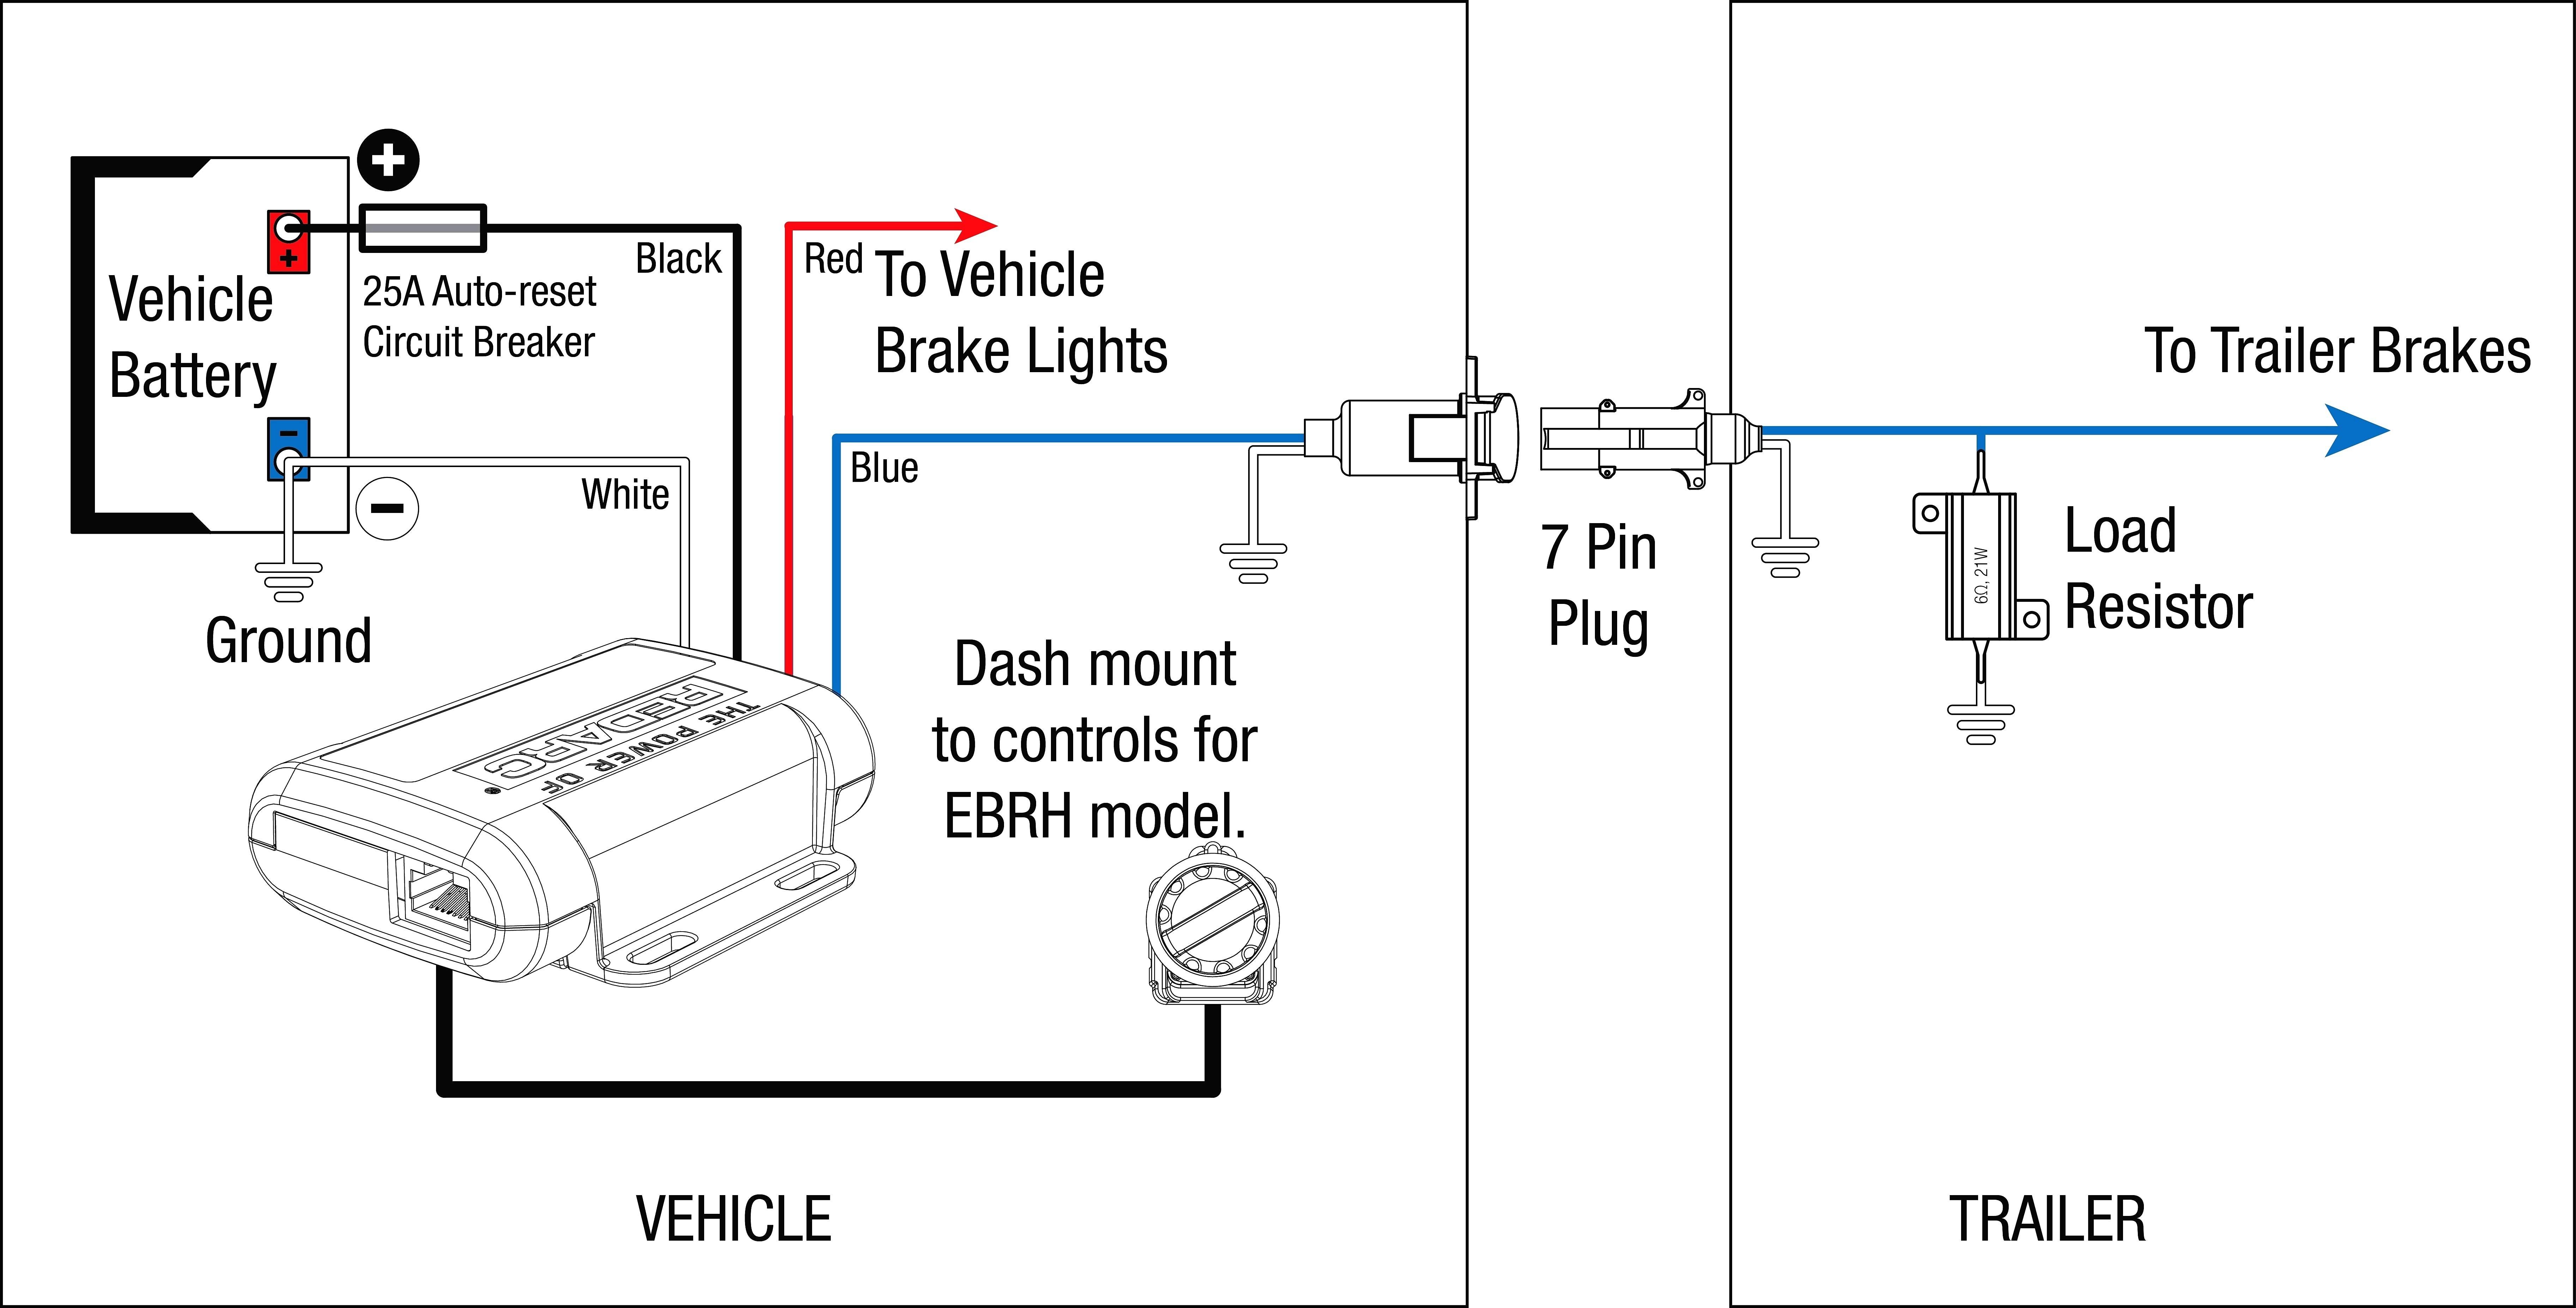 Wiring Diagram Trailer Brakes Valid Kelsey Electric Brake Controller Wiring Diagram